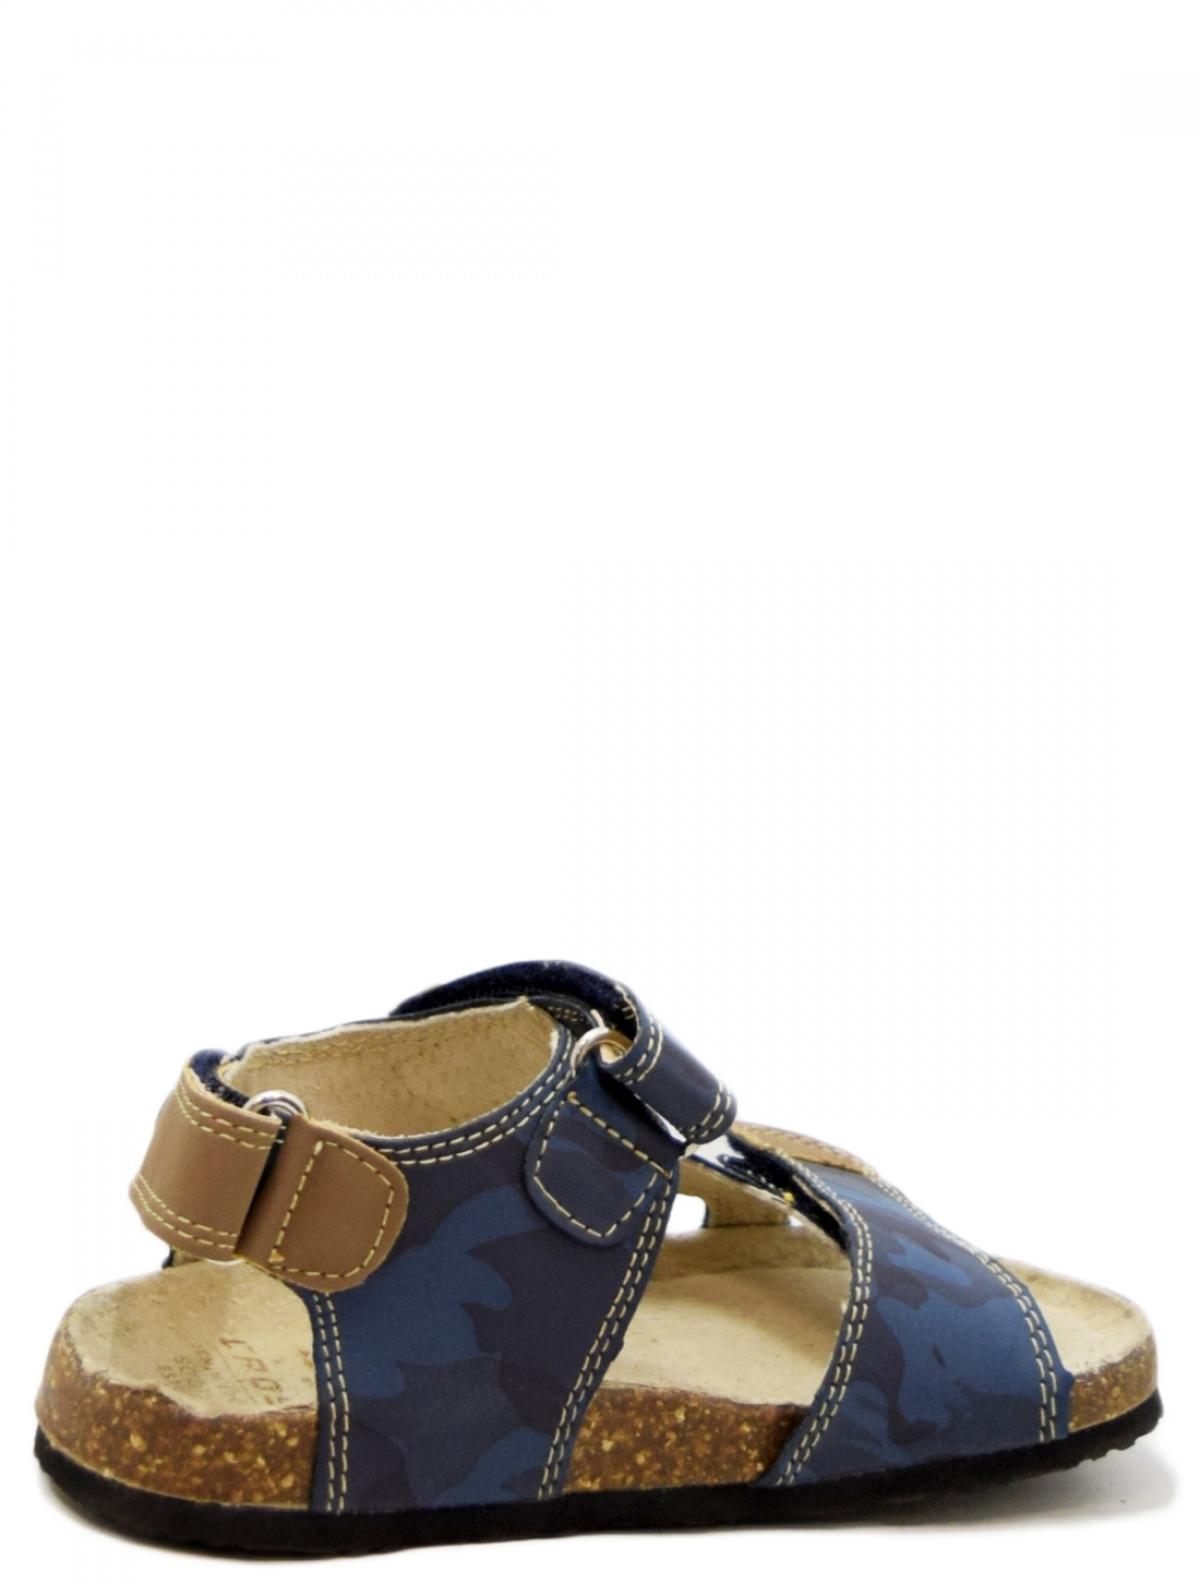 CROSBY 287116/01-03 сандали для мальчика